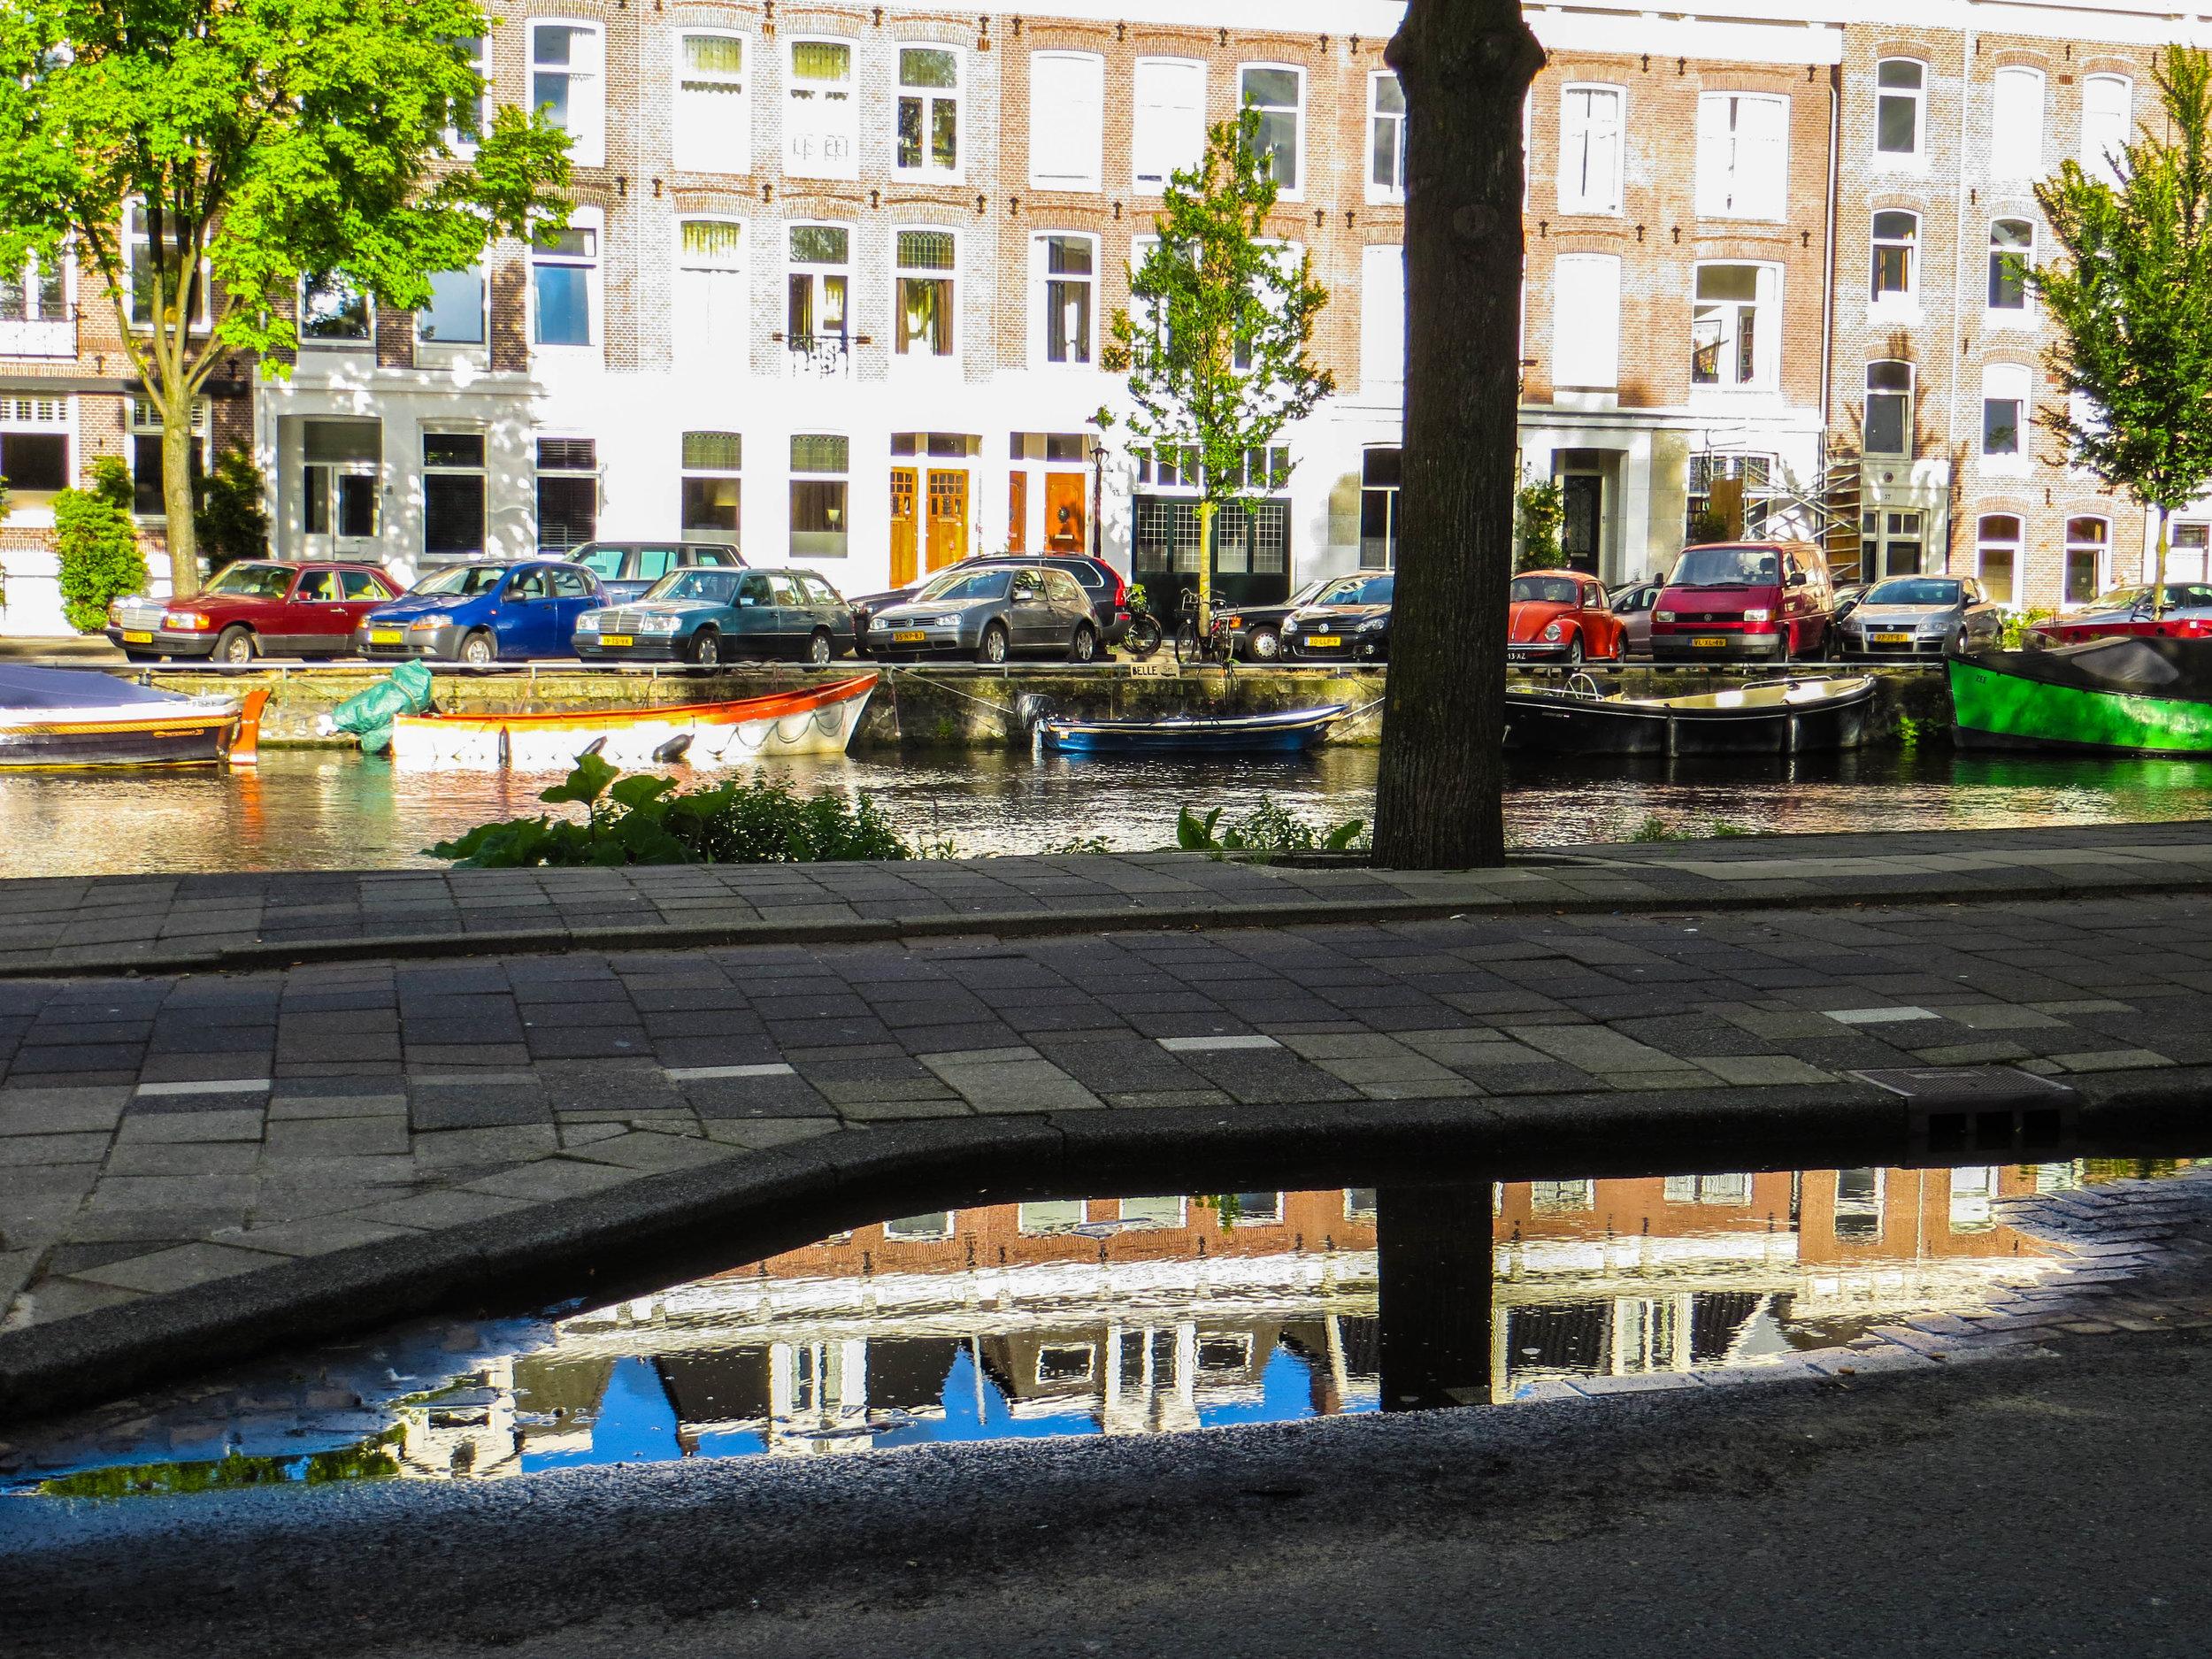 amsterdam-netherlands-street-photography-33.jpg